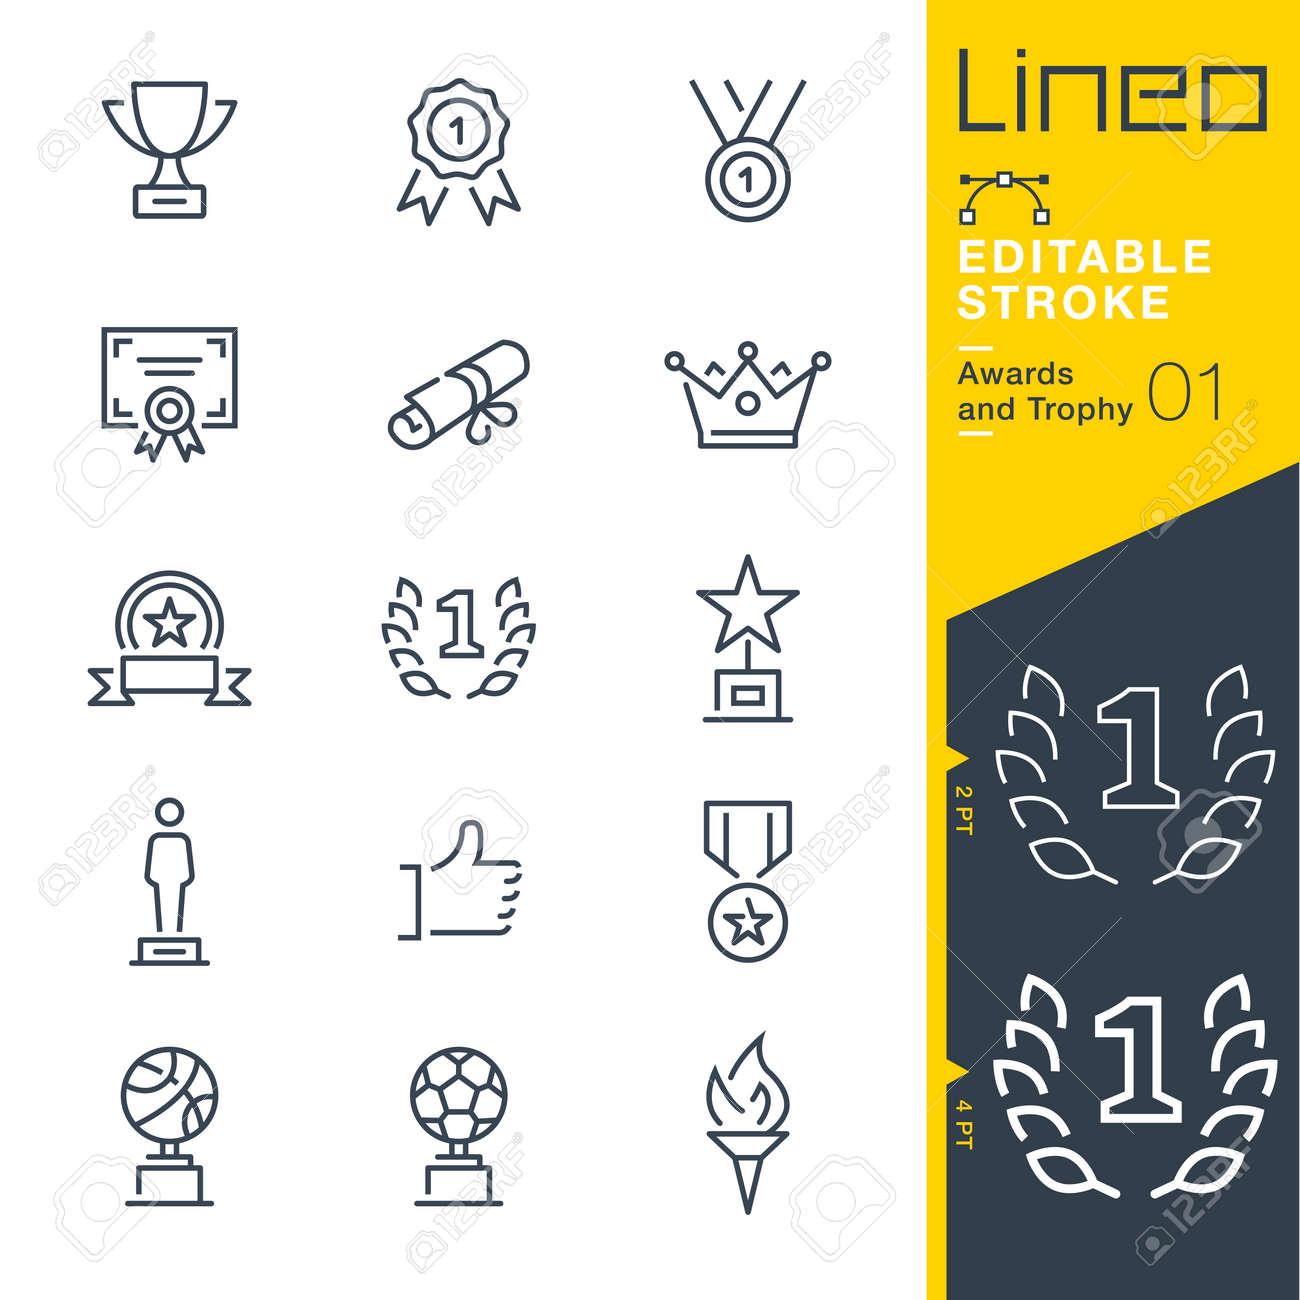 Lineo editable stroke. Icon set. - 87729302